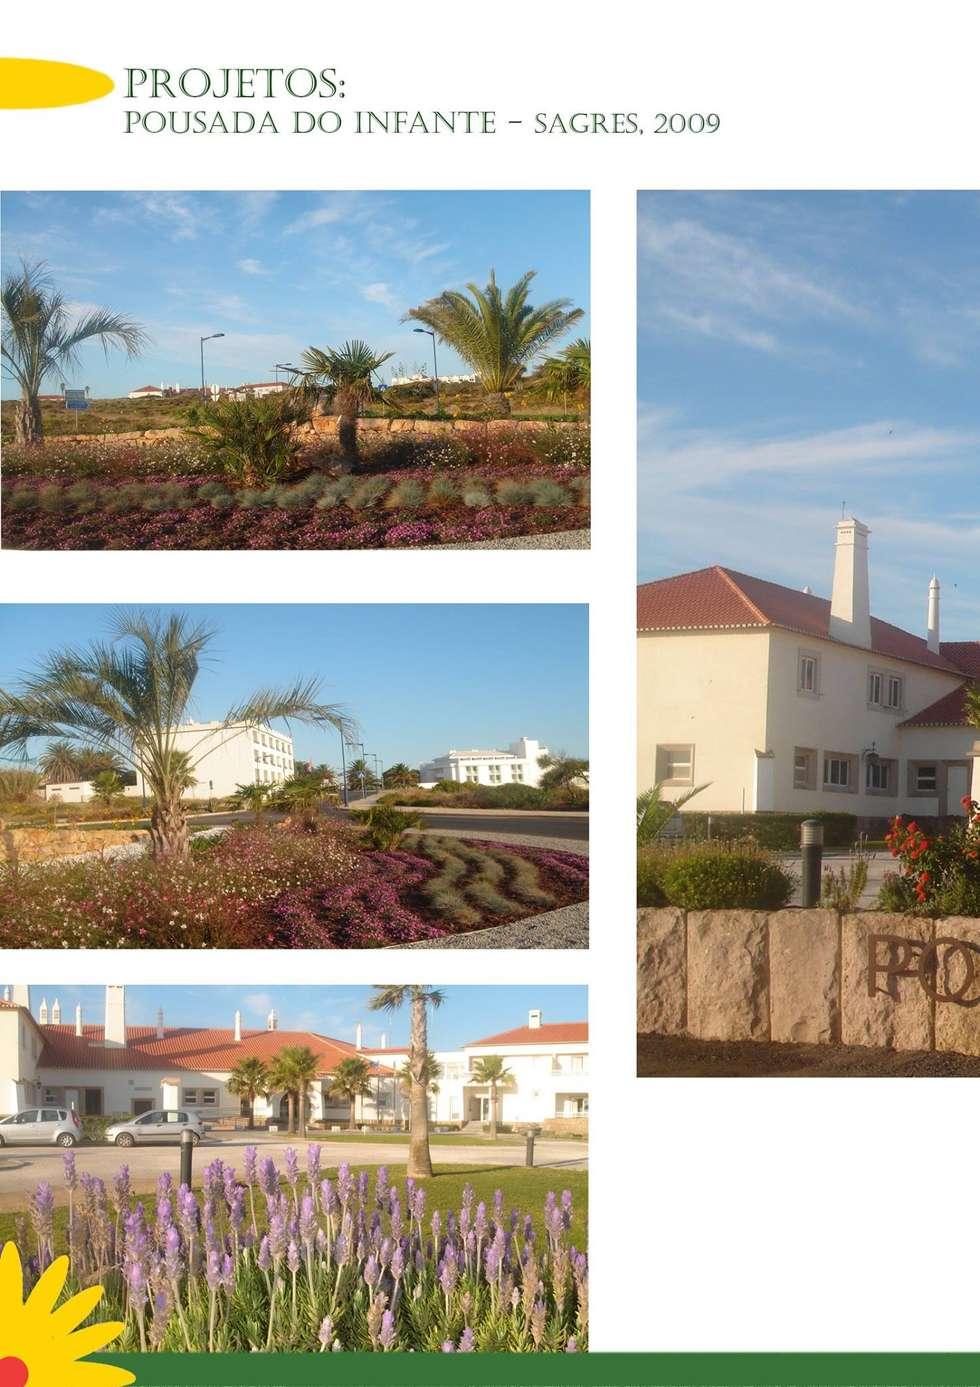 Pousada do Infante Sagres: Hotéis  por ECOSSISTEMAS; Áreas Verdes e Sistemas de Rega.